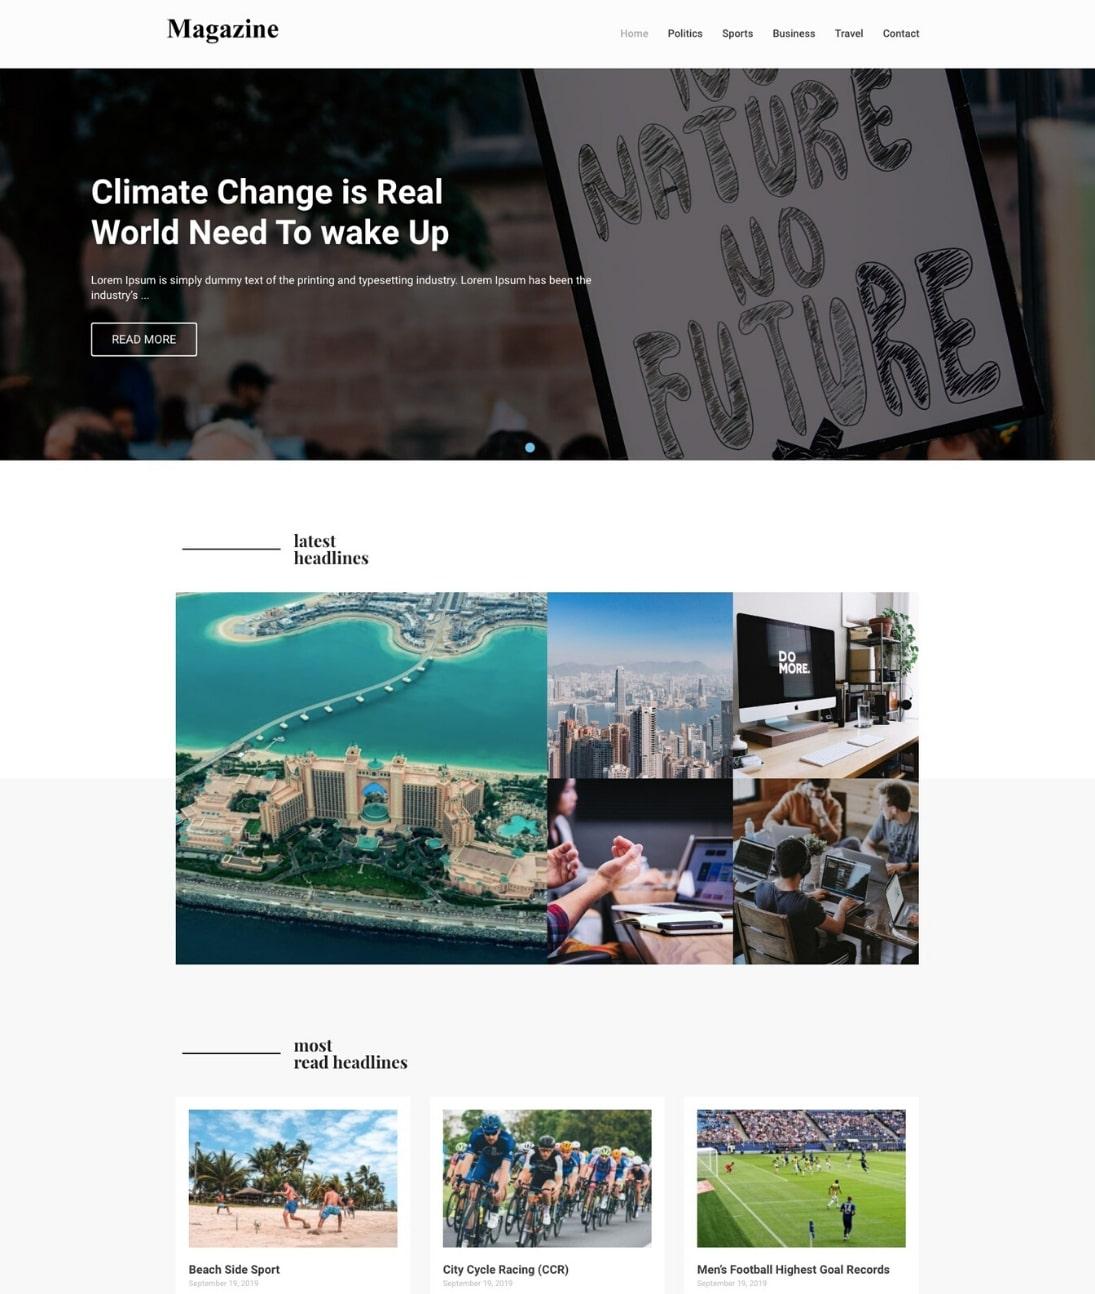 WordPress Magazine template by CyberChimps